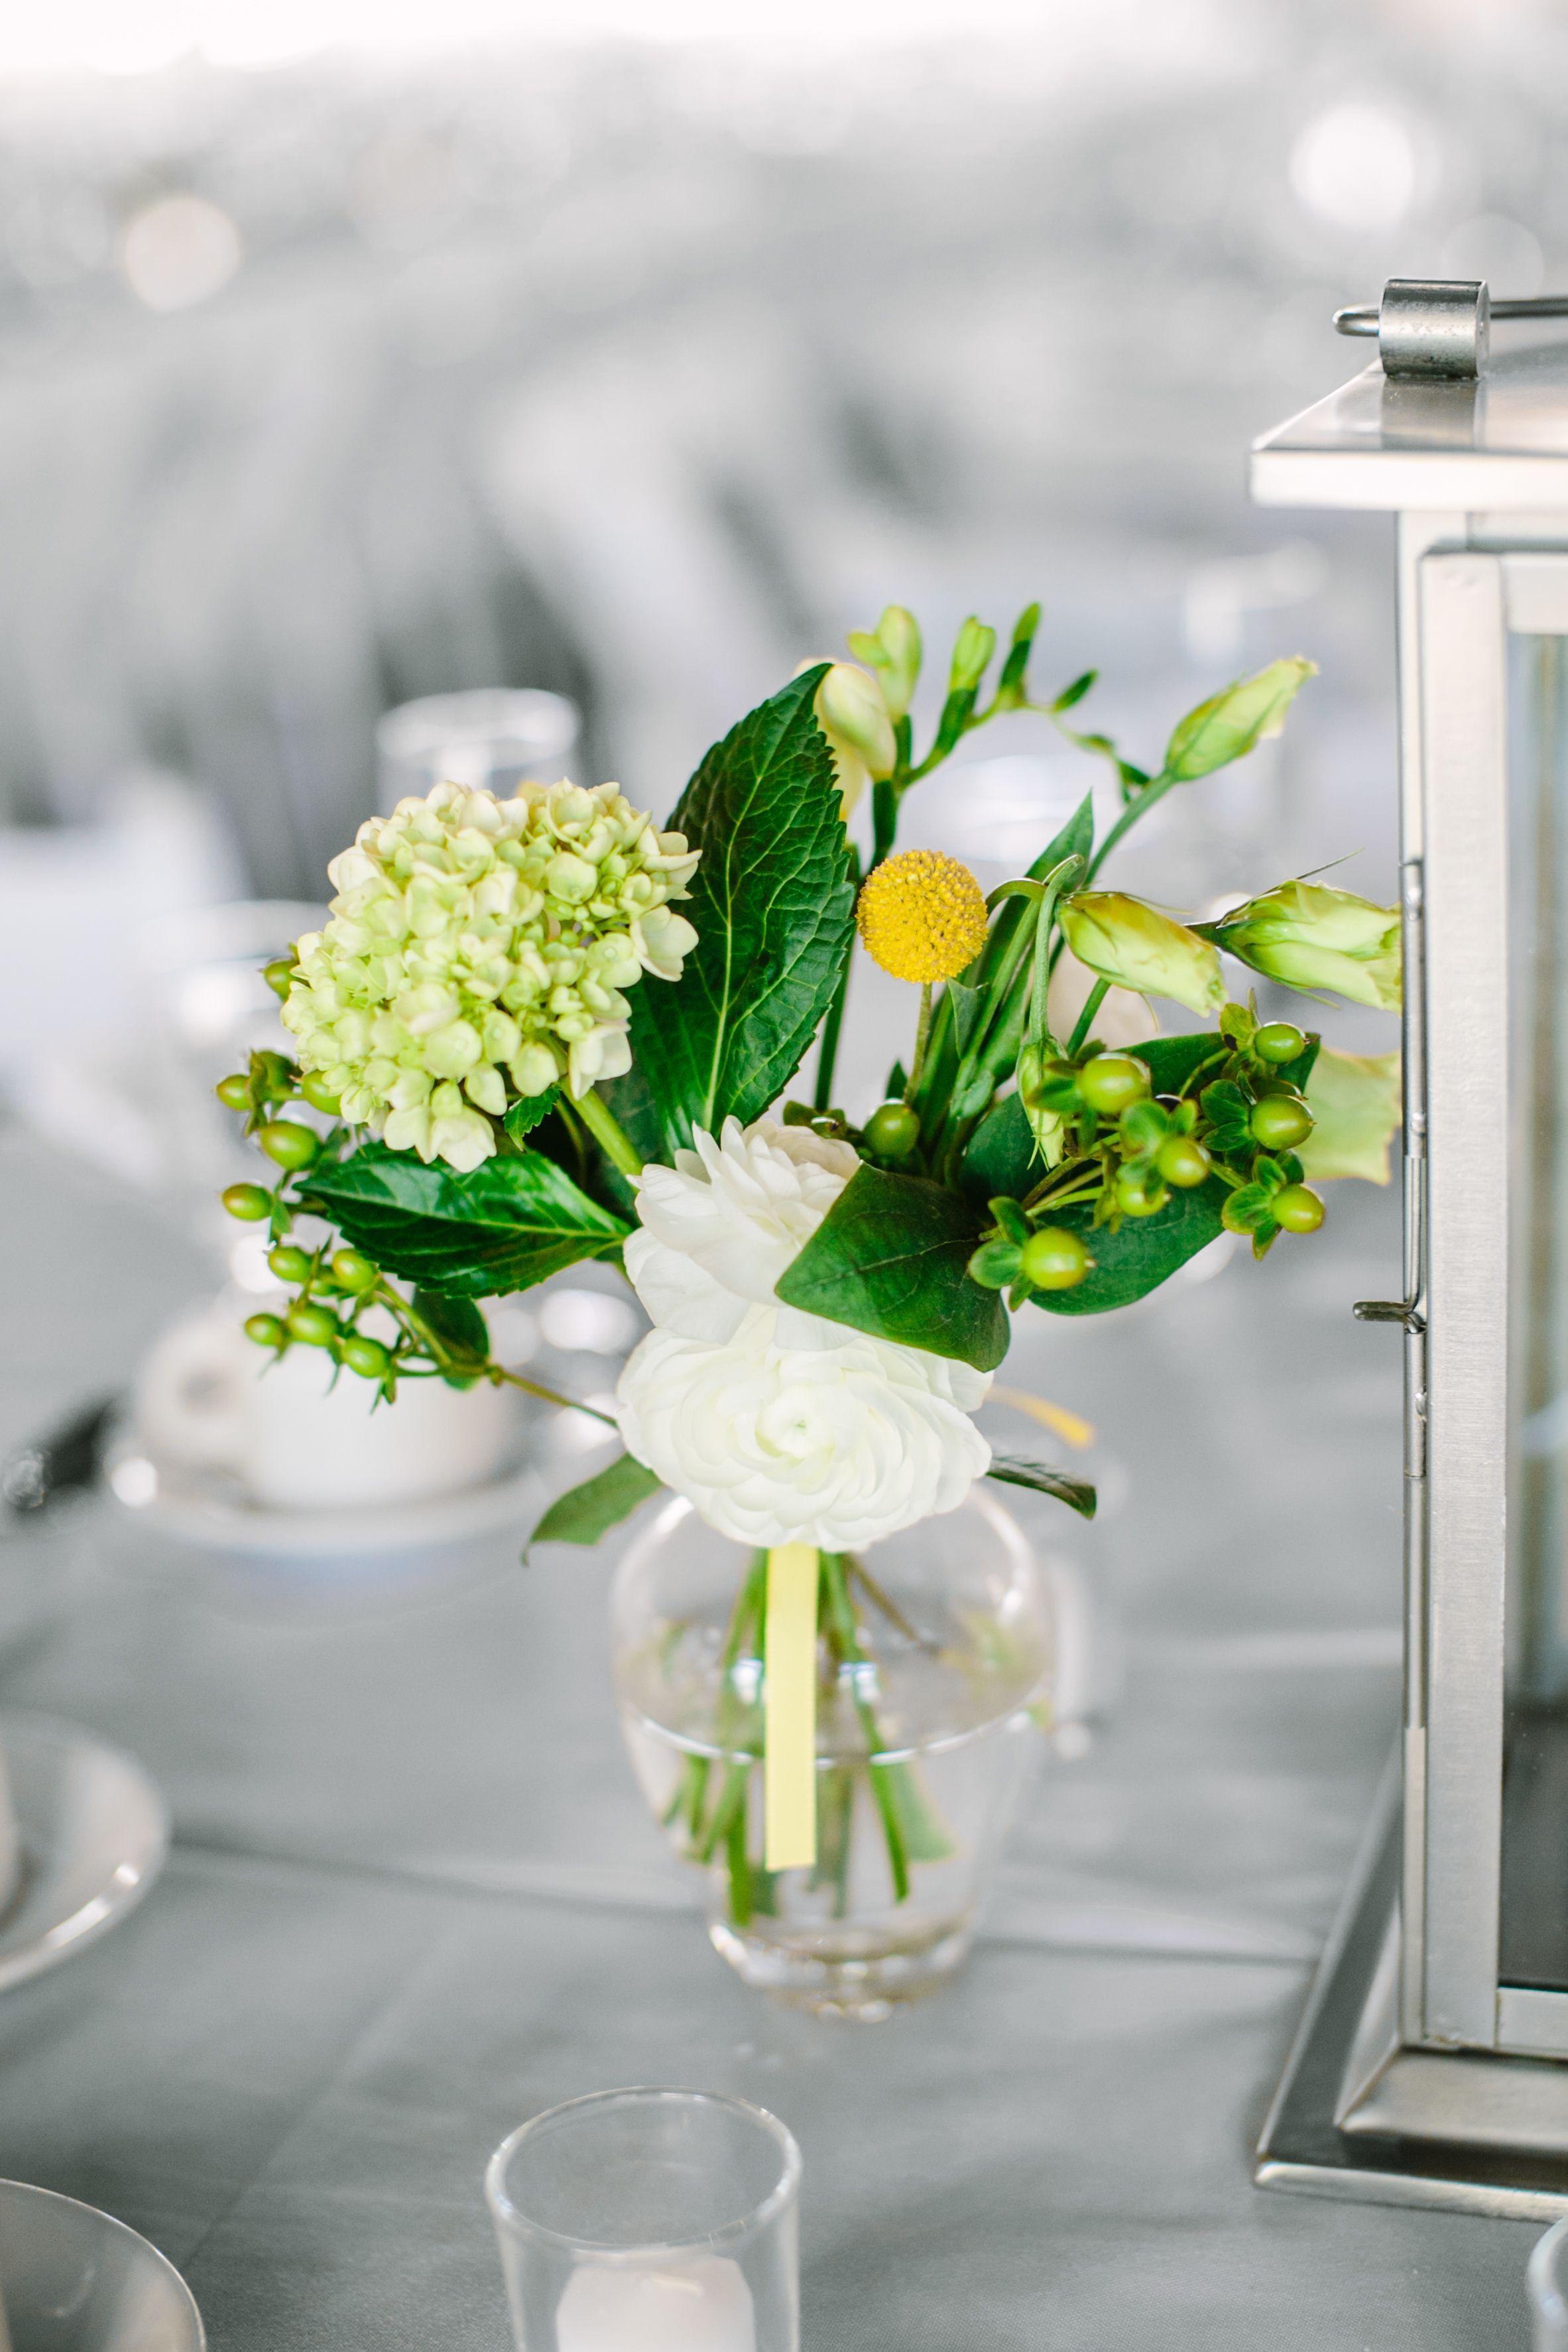 Diy decorations for wedding  Summery DIY Centerpieces  centerpieces  Pinterest  Diy